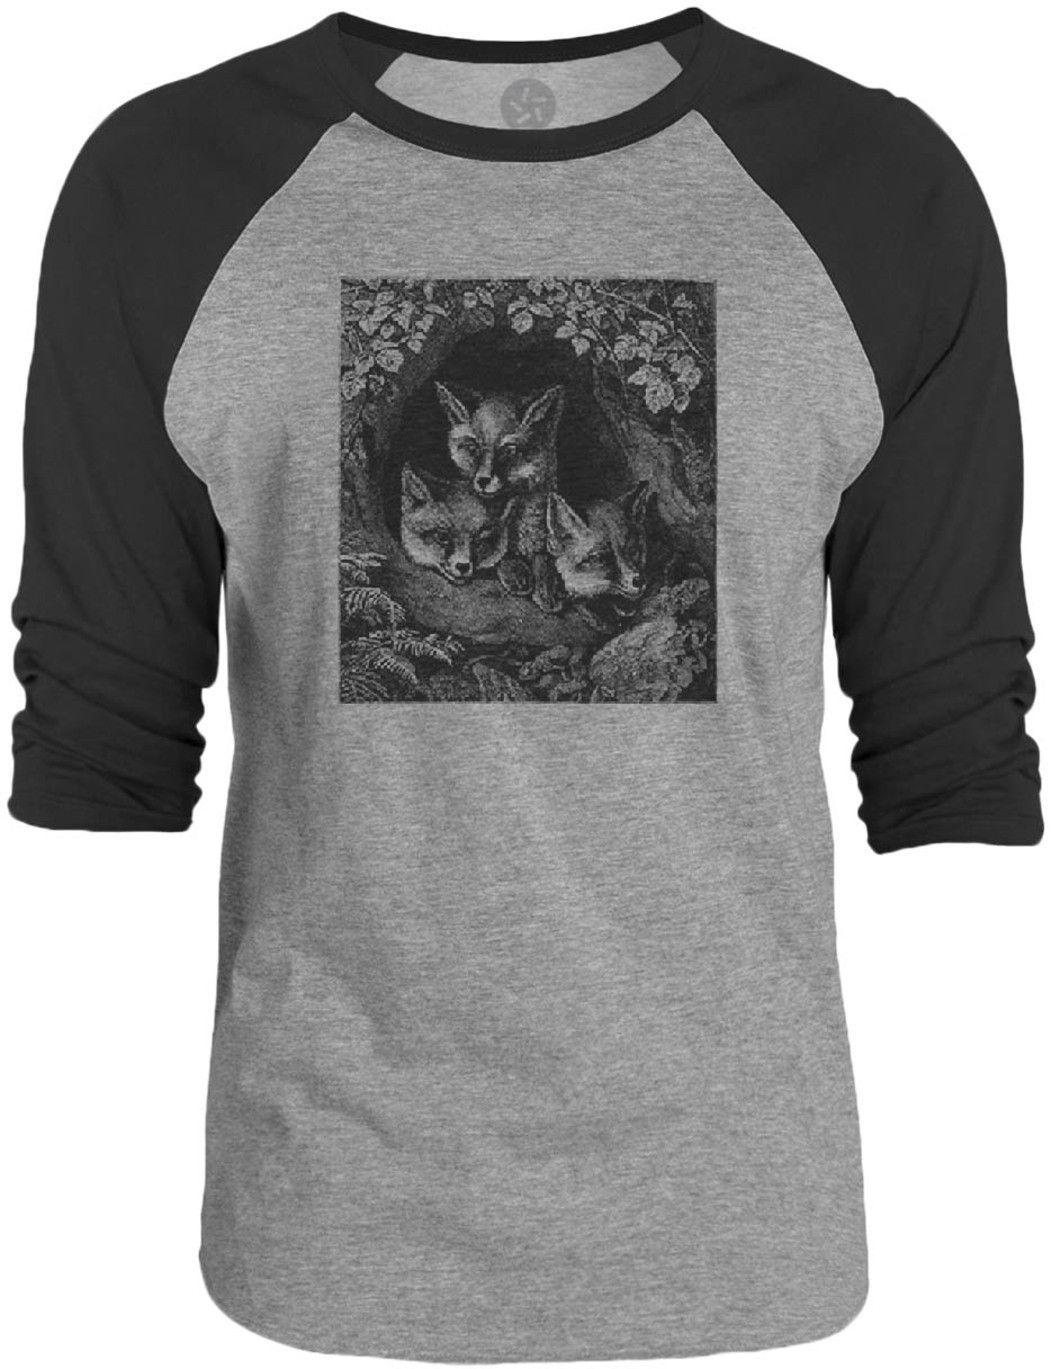 Big Texas Family of Foxes (Black) 3/4-Sleeve Raglan Baseball T-Shirt